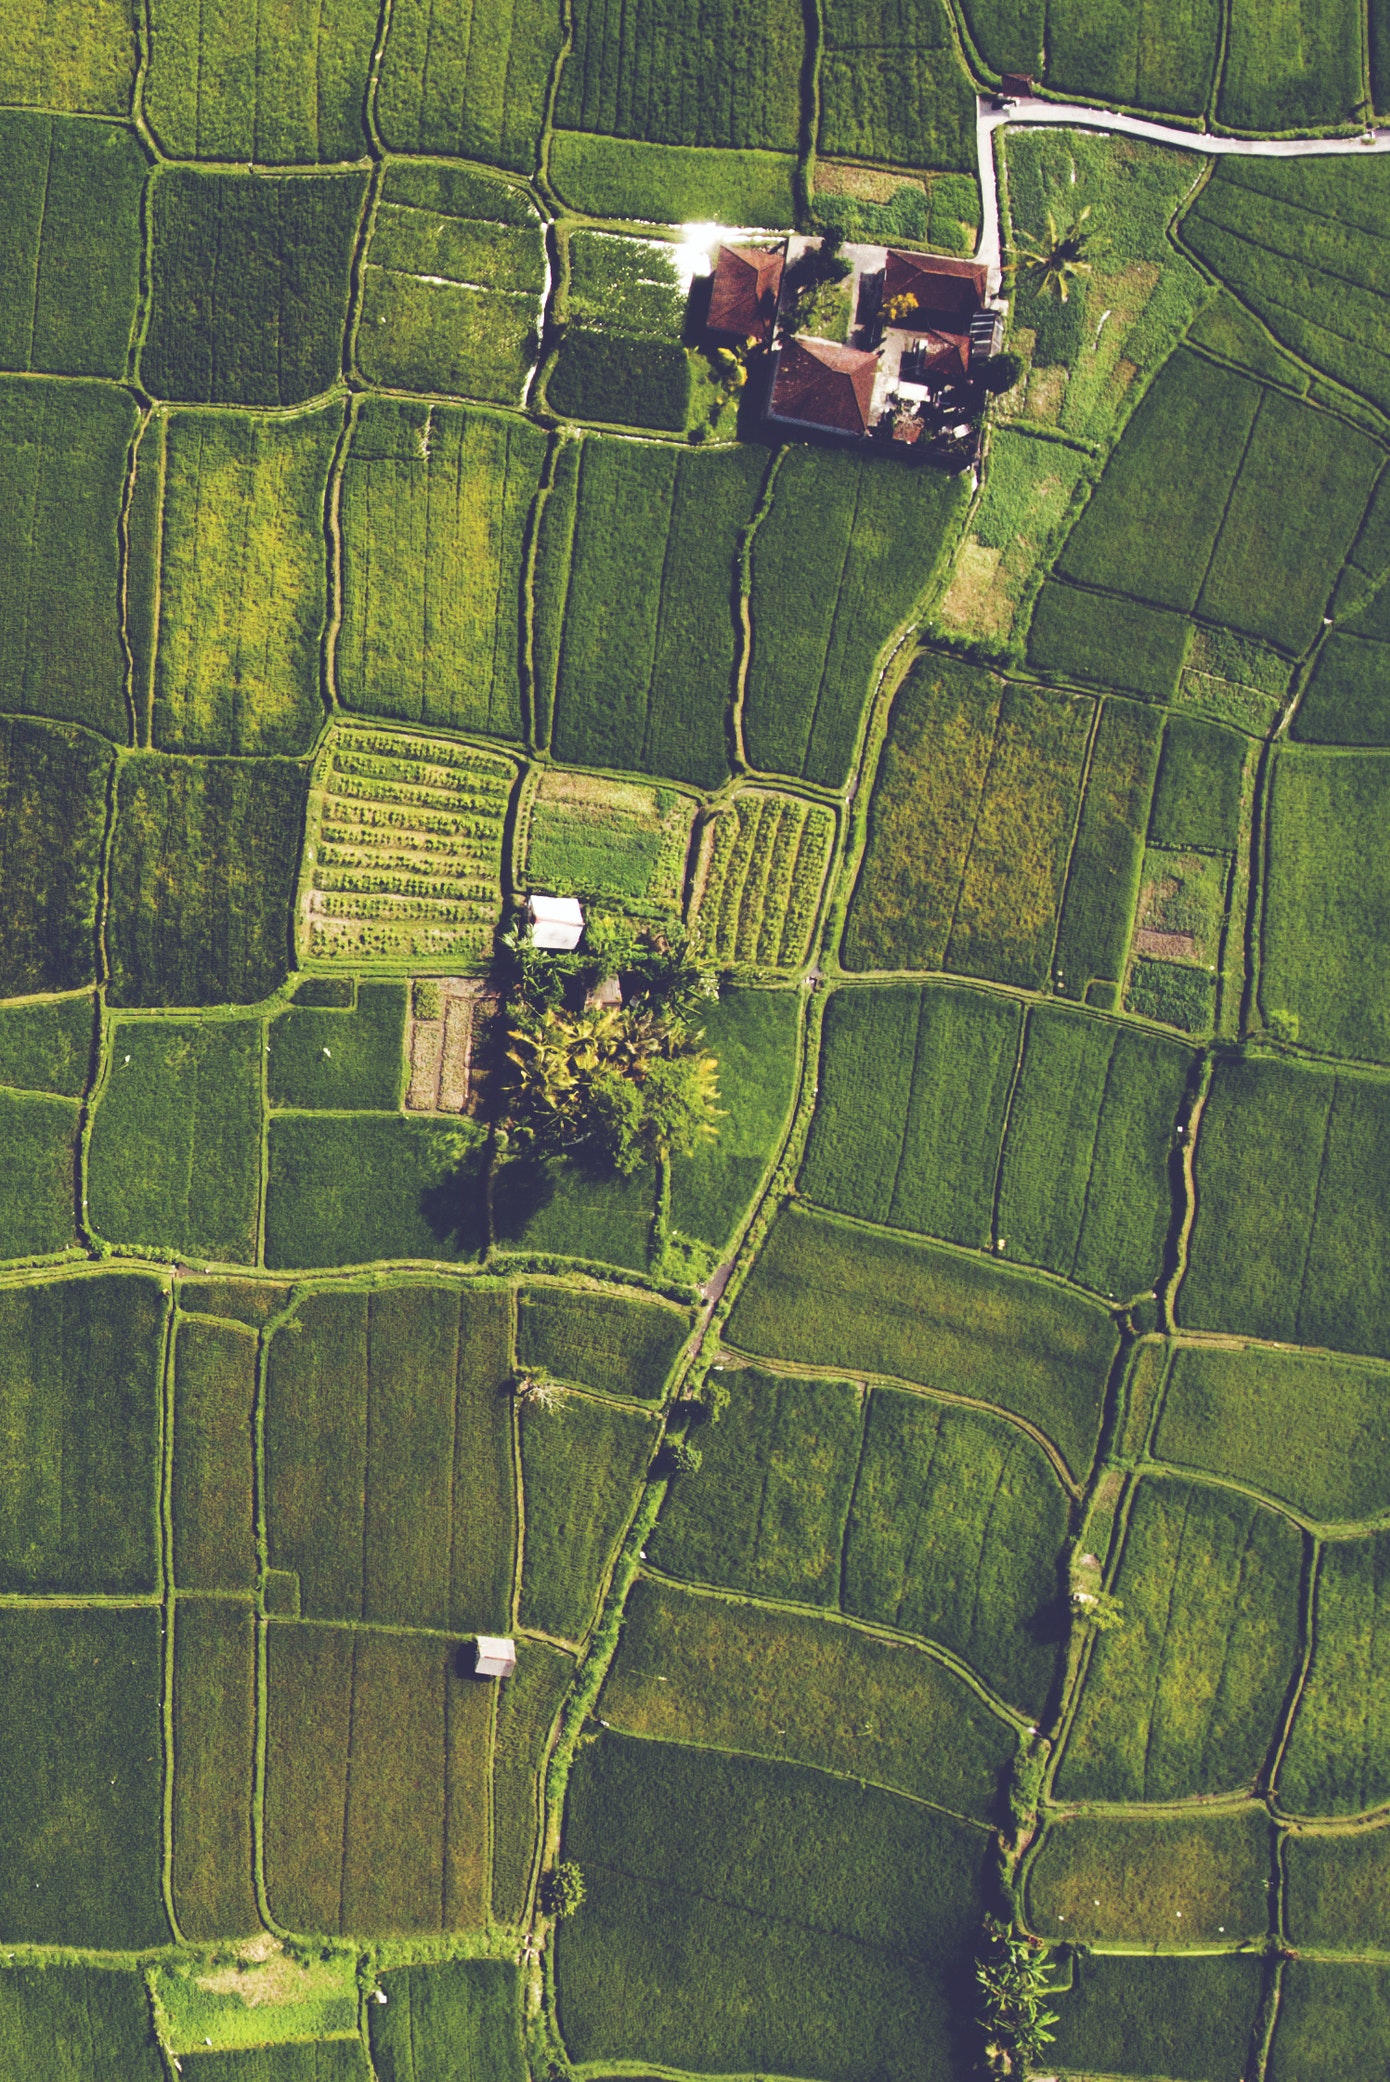 Drone shot of rice paddies